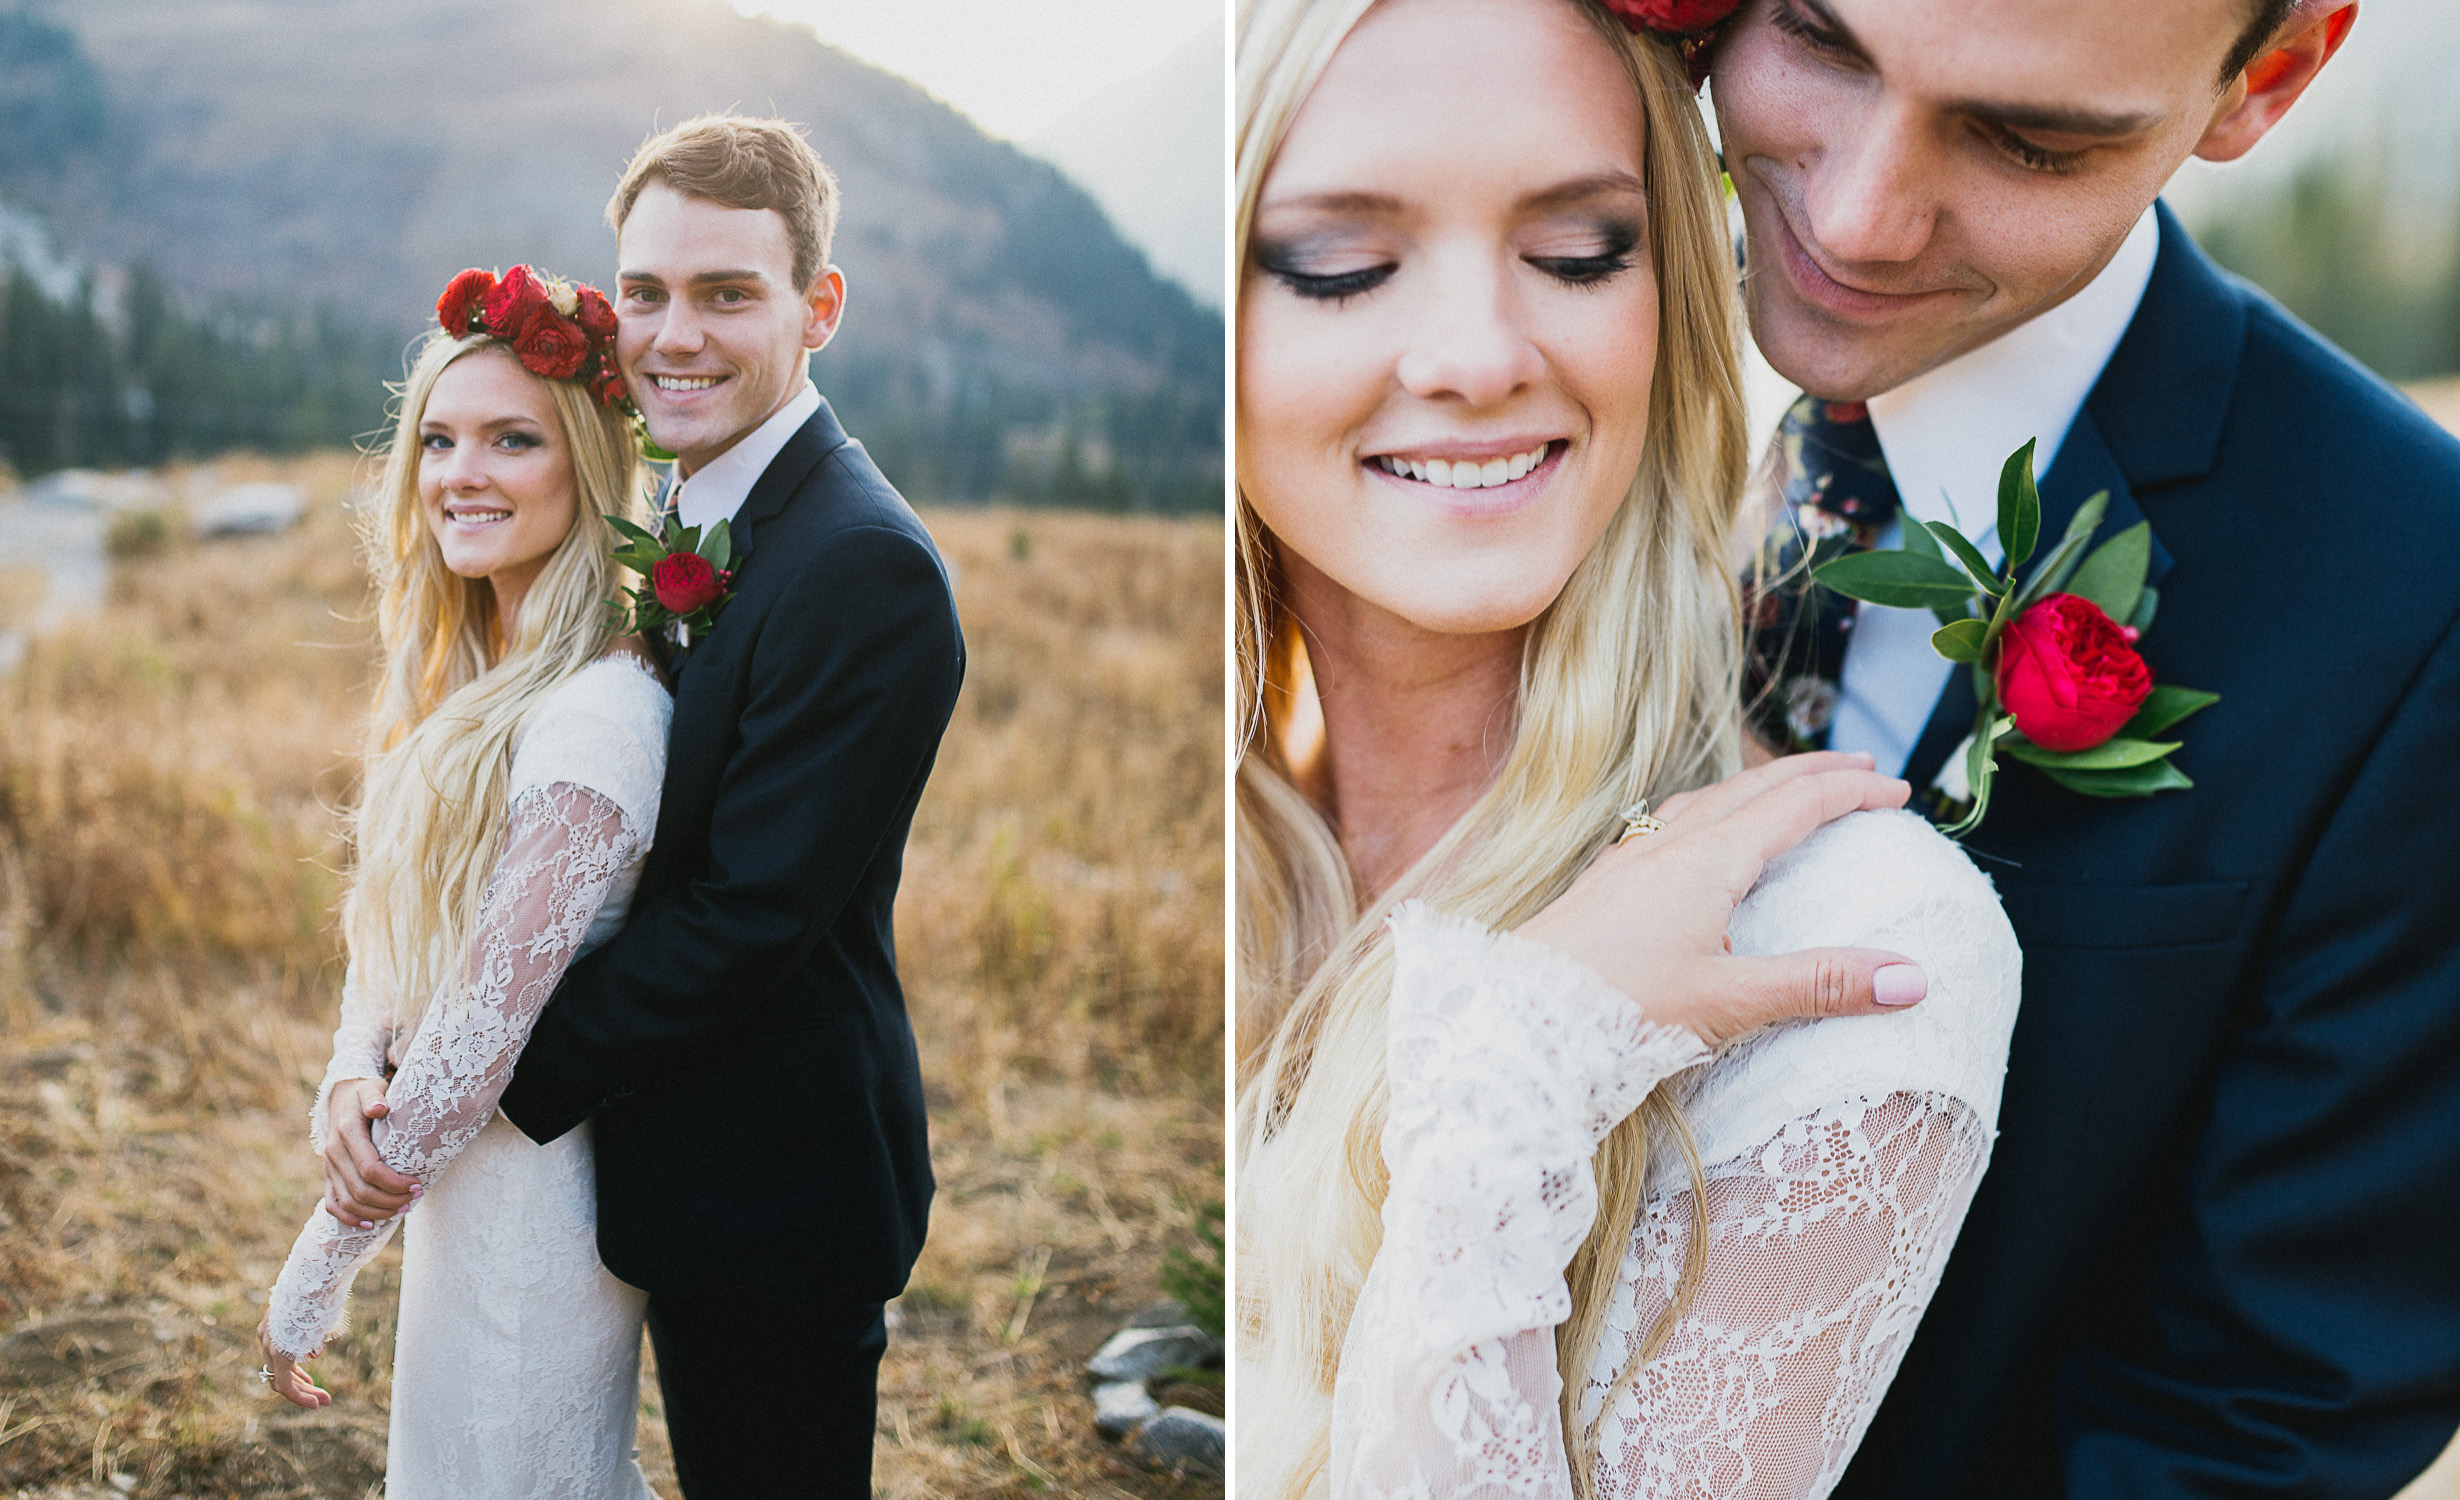 utah-wedding-photographer-salt-lake-city02.jpg